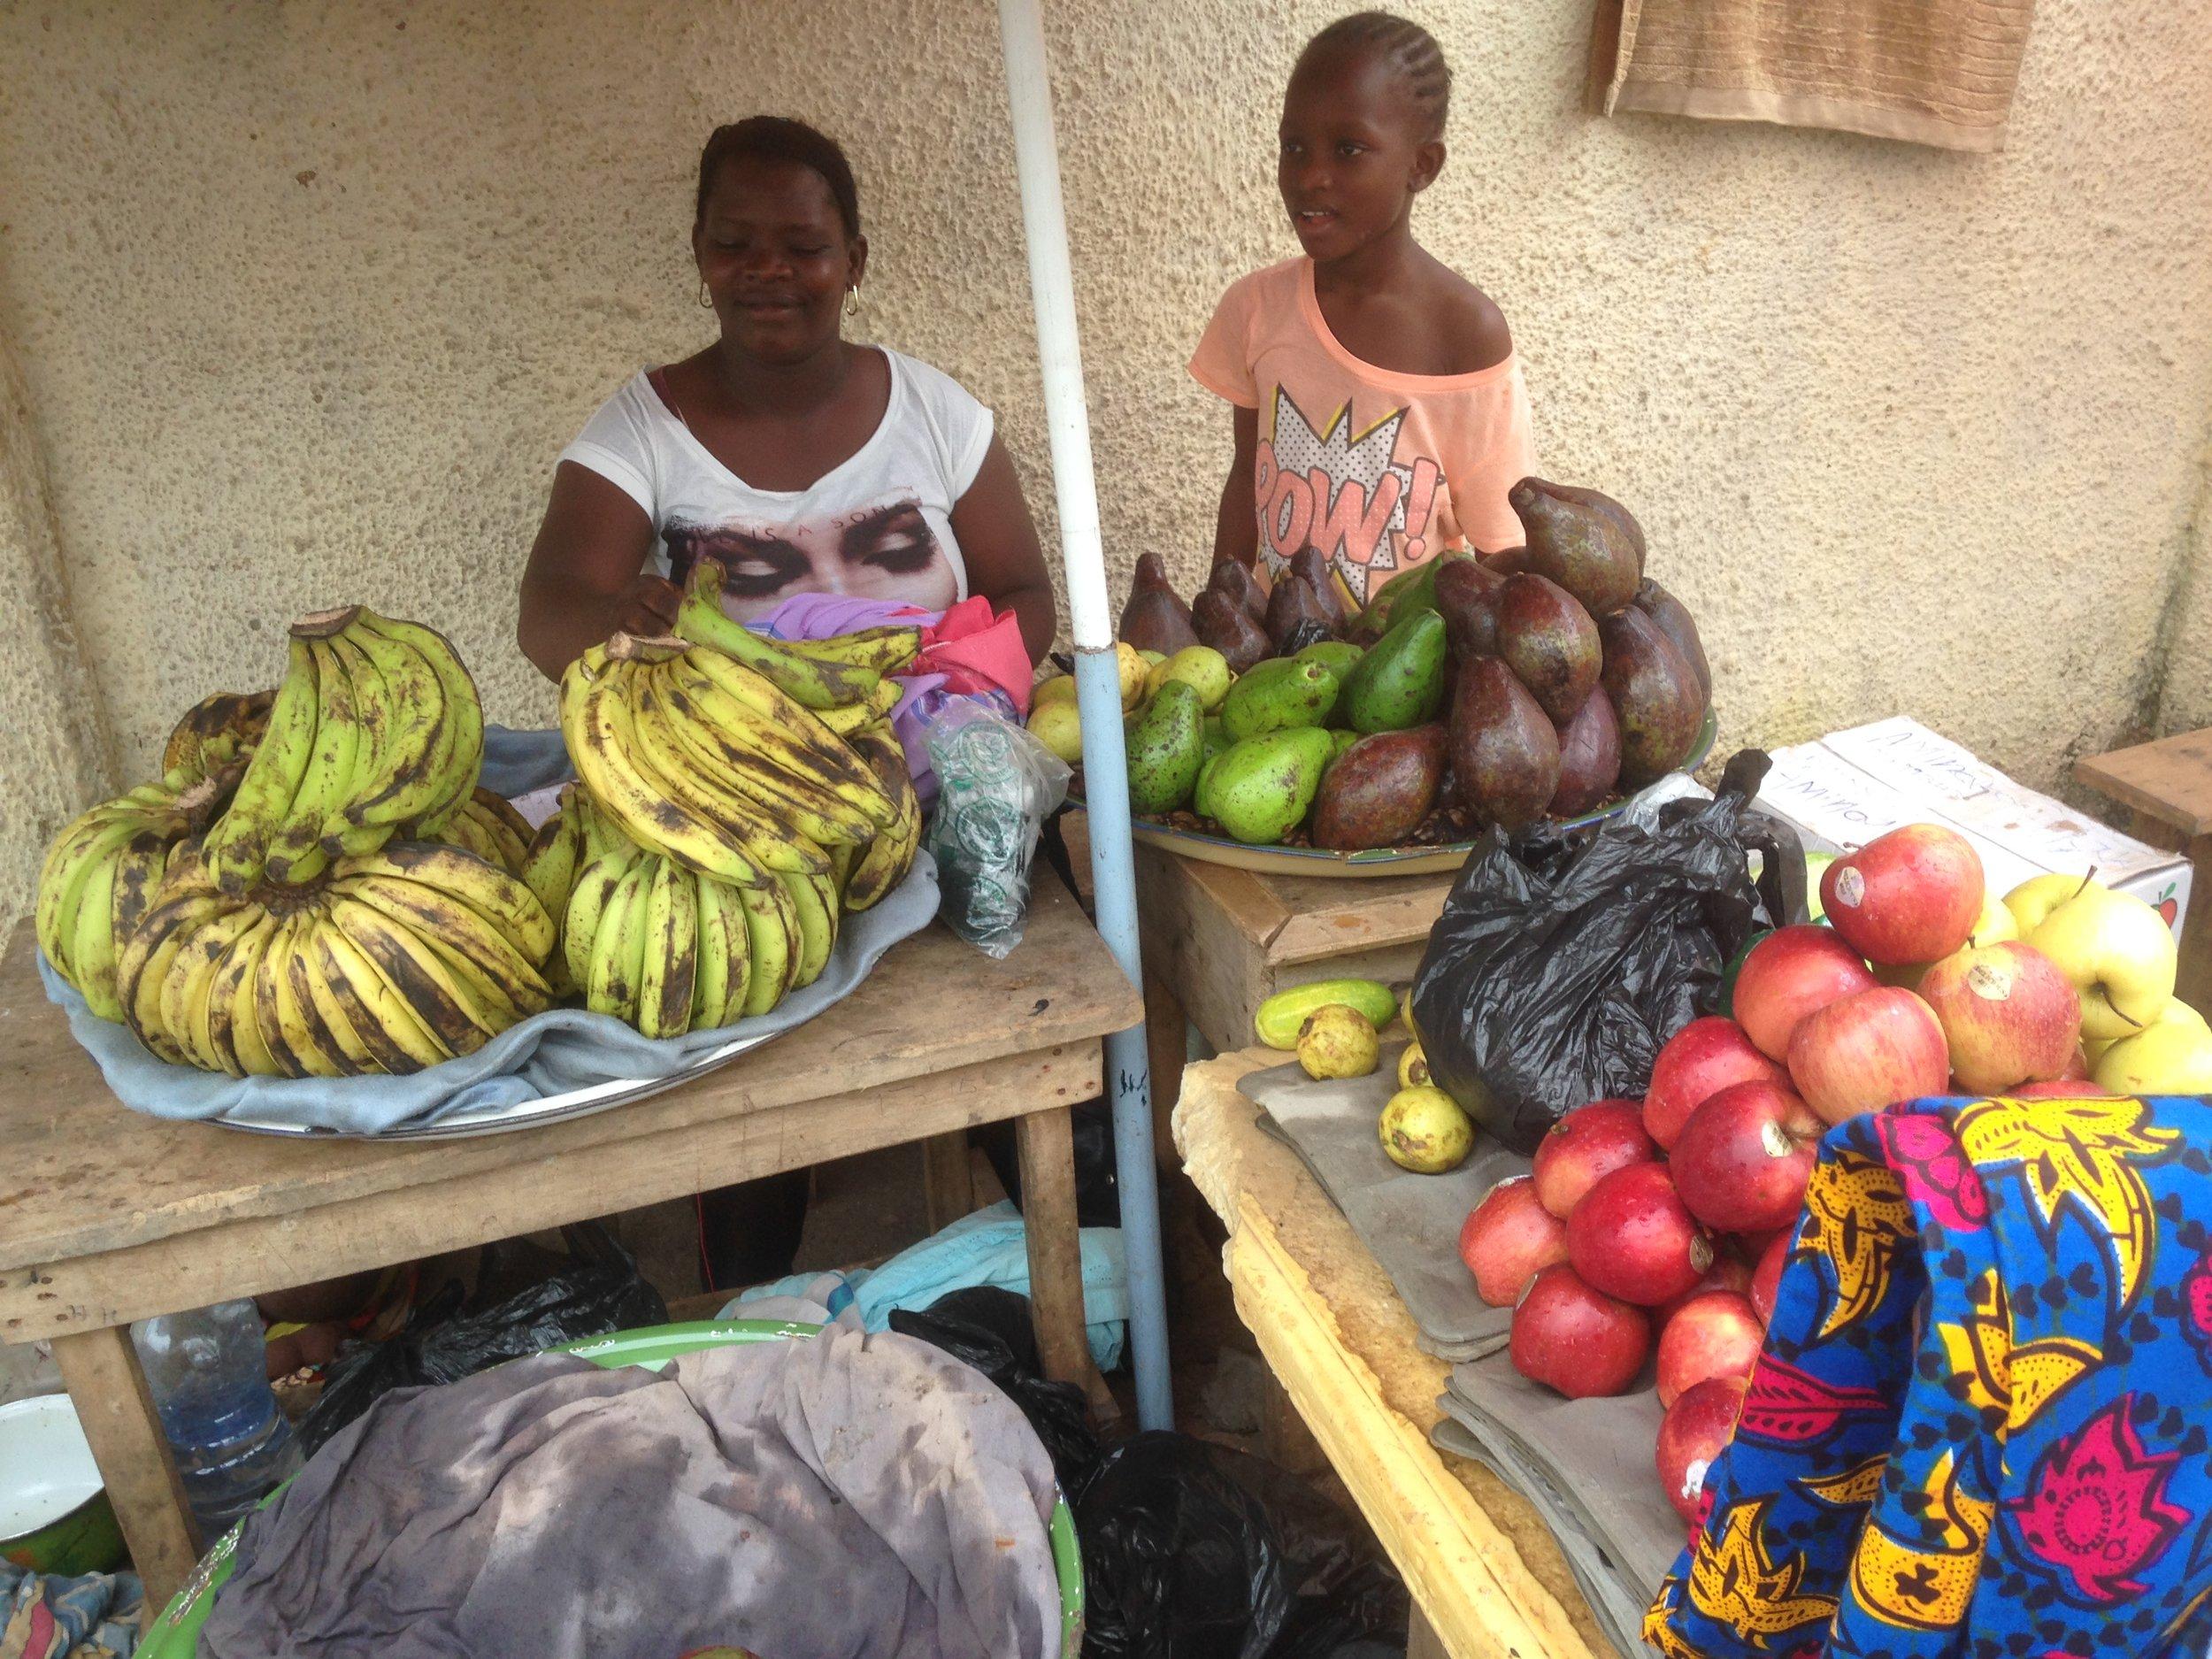 Market stall, Makeni, Sierra Leone